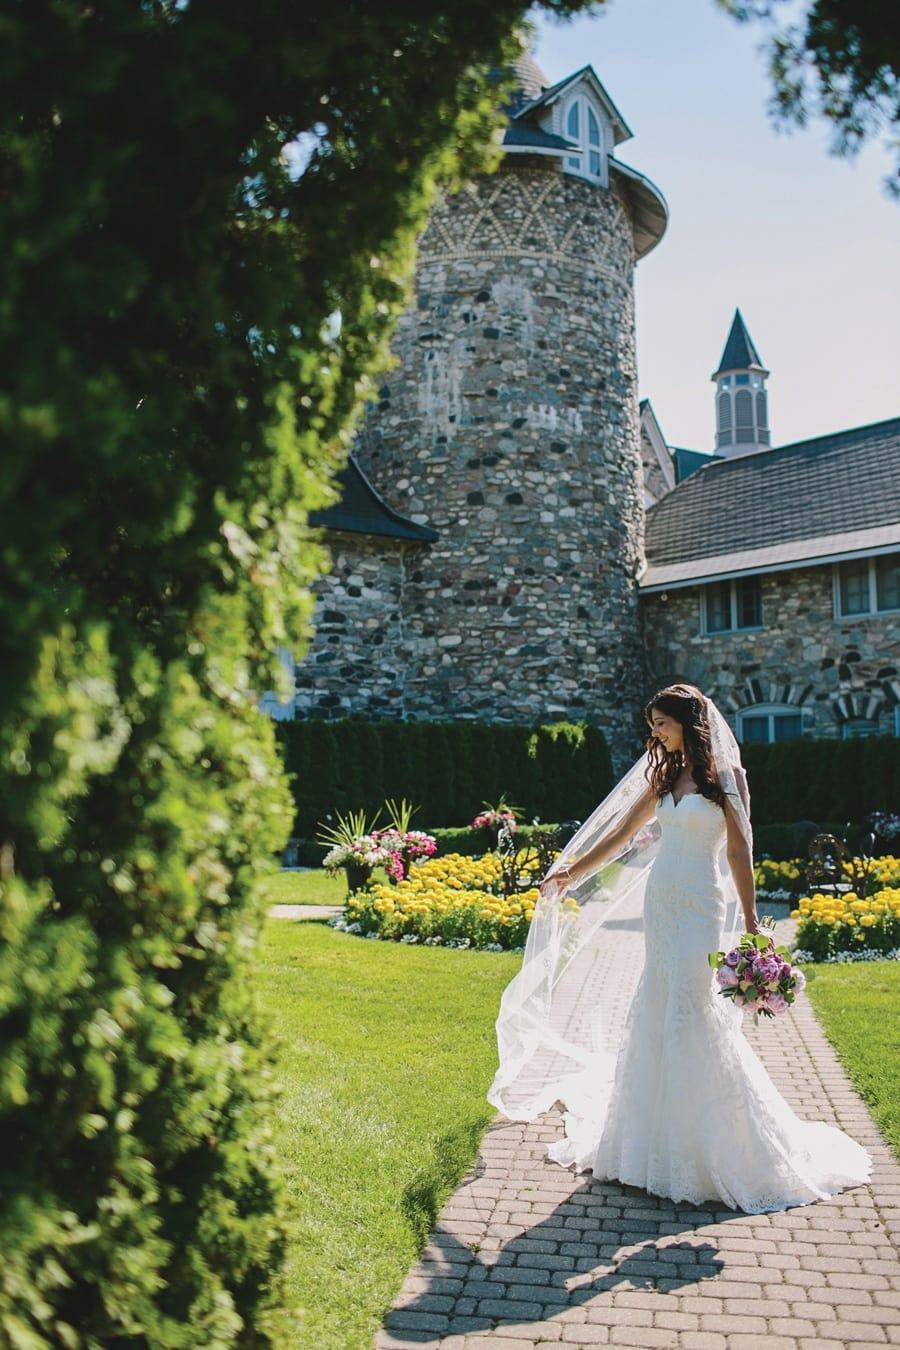 Top 10 Best Northern Michigan Wedding Venues - MyNorth.com